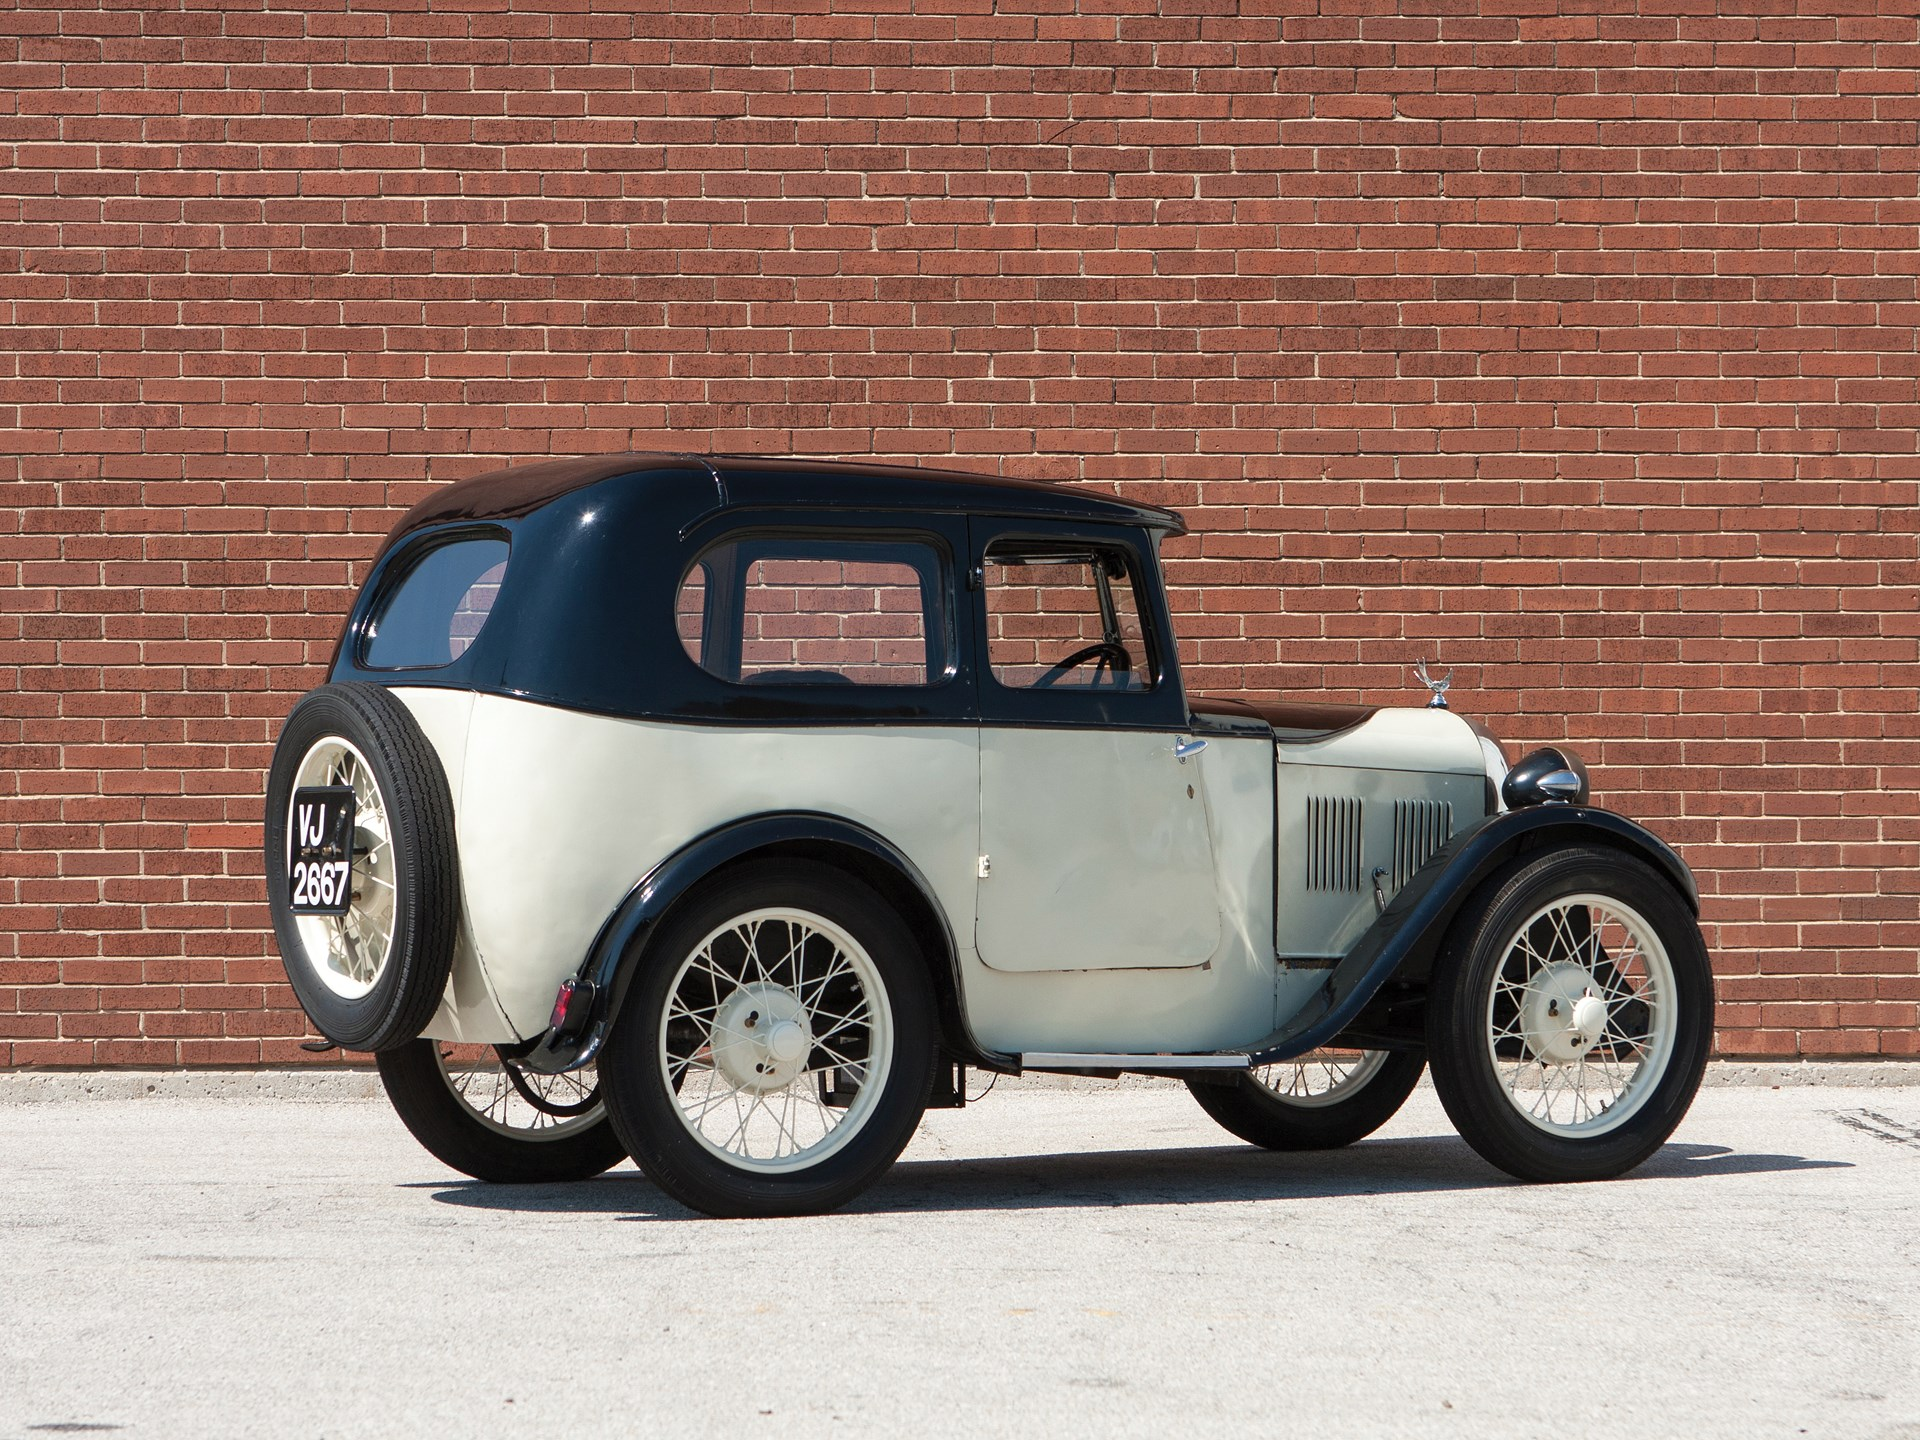 1930 Austin Seven Saloon by Swallow